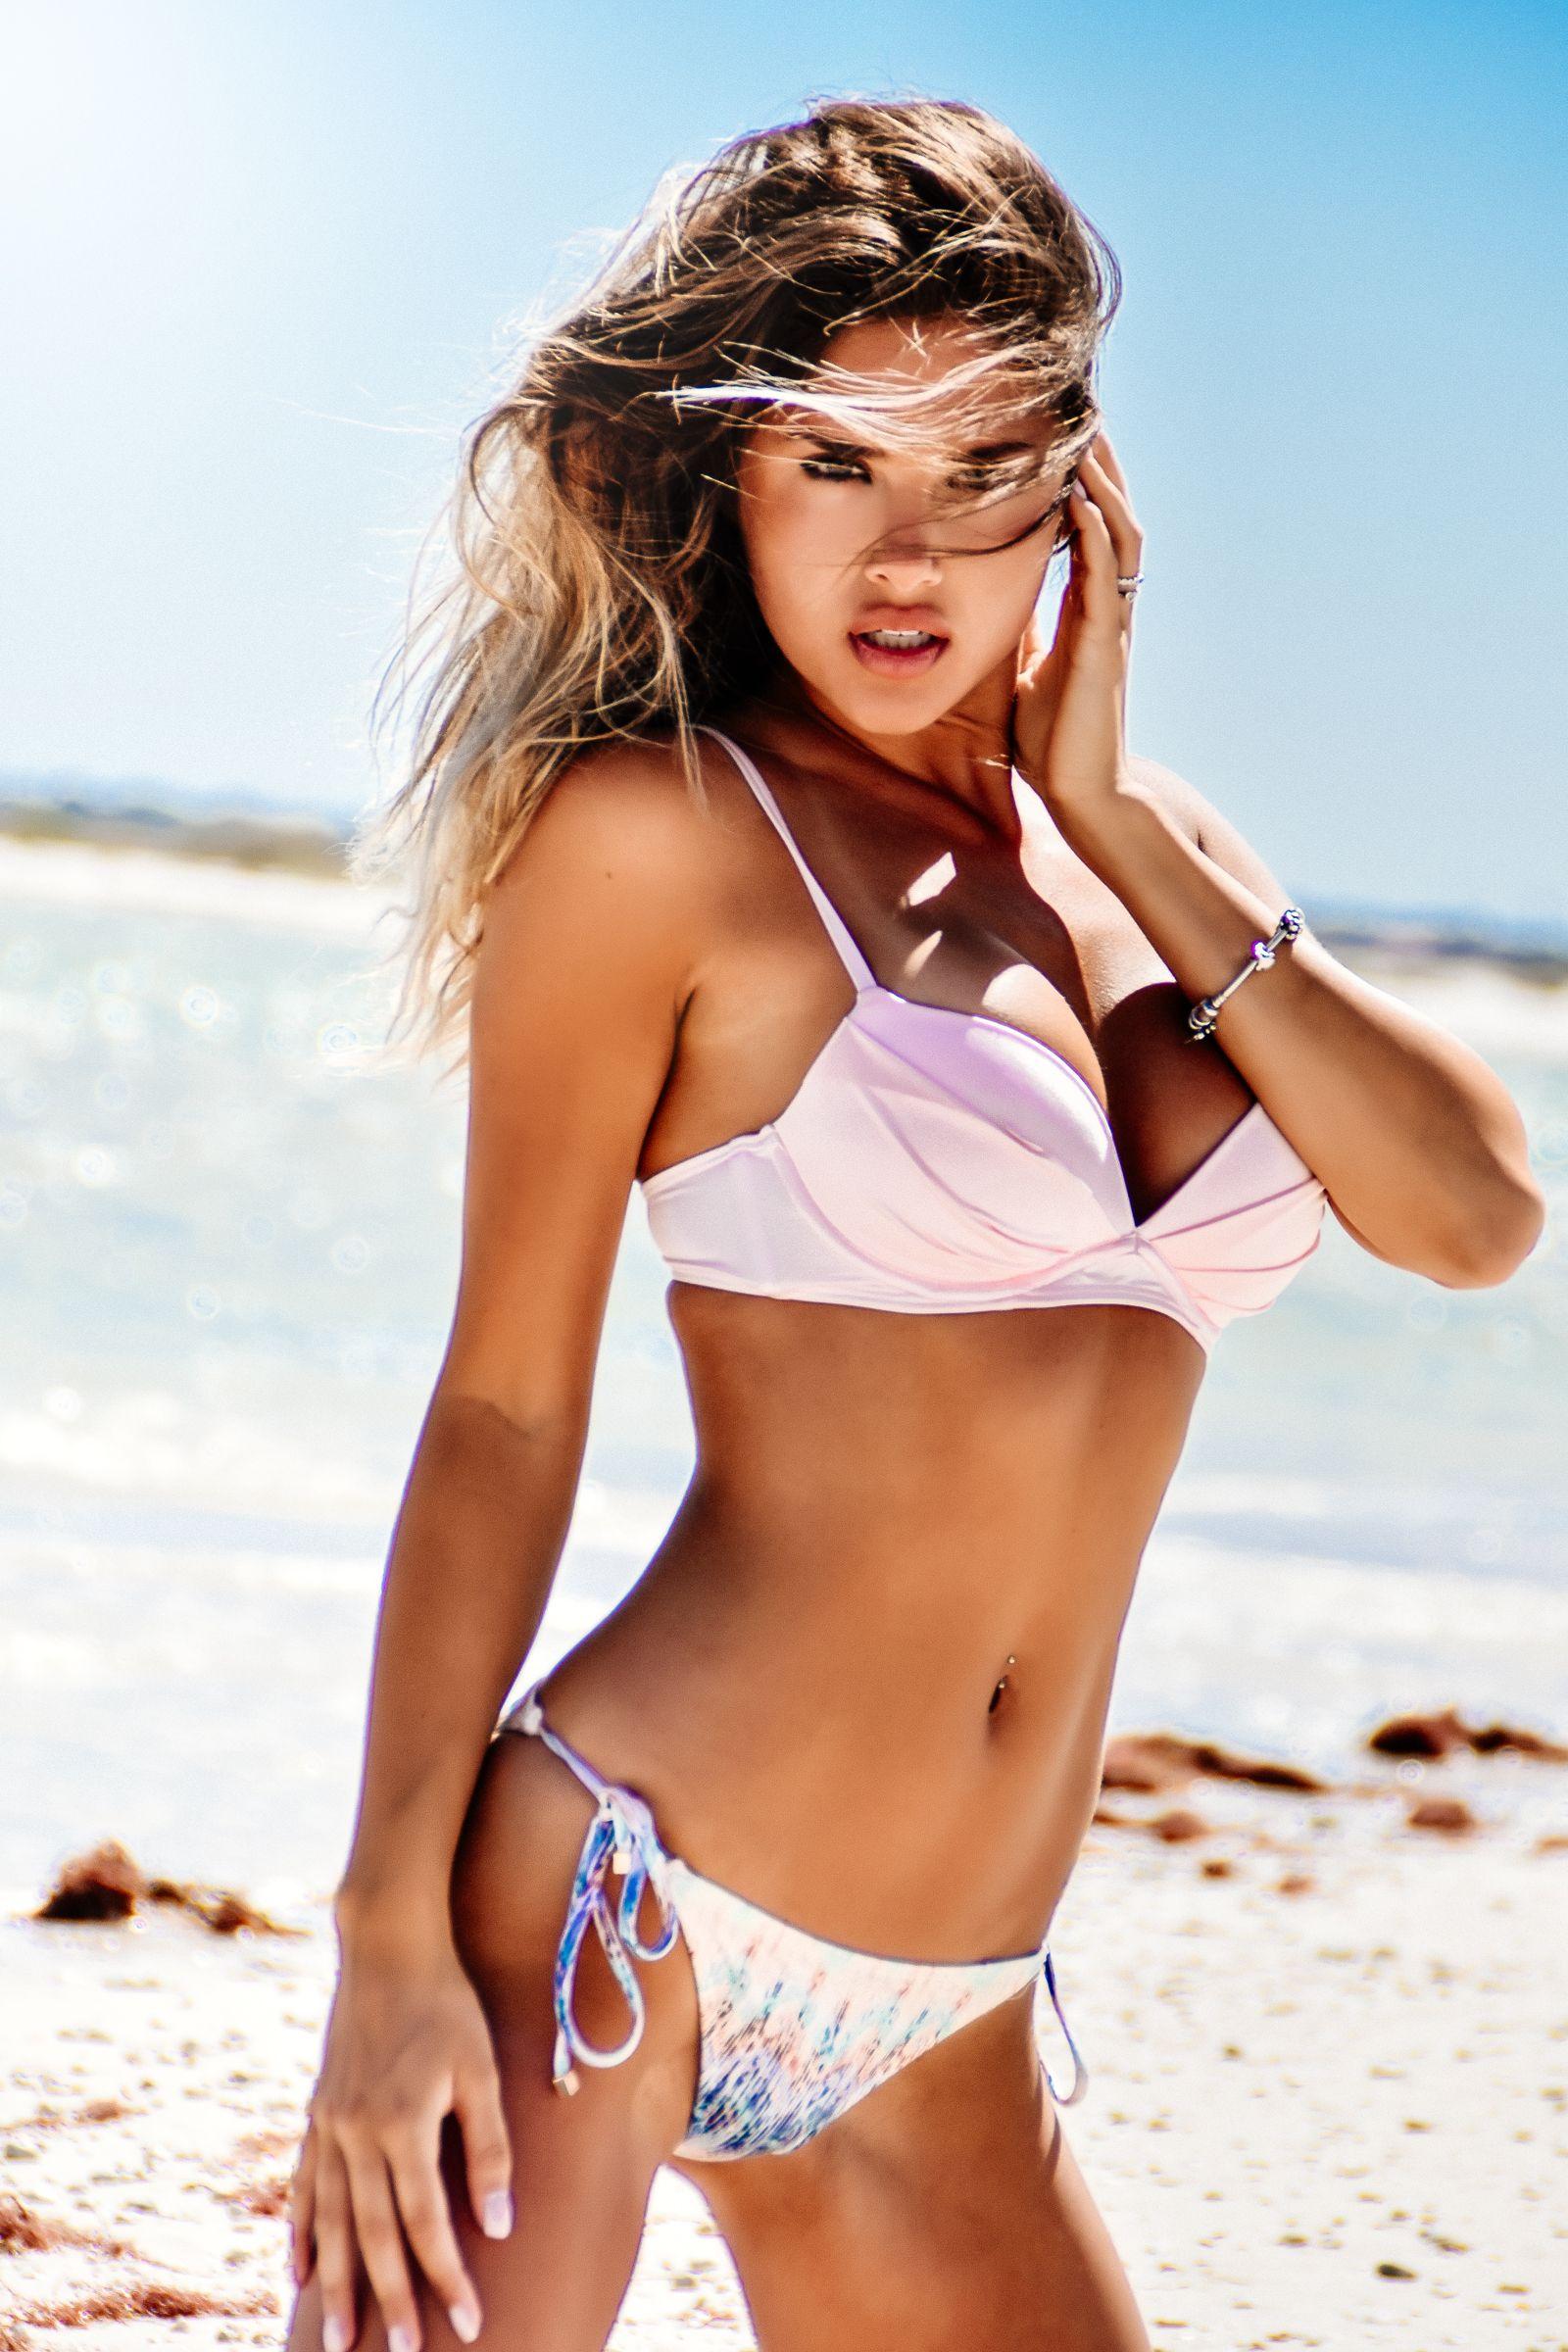 Bikini Carmel Anderson nude (36 photos), Topless, Cleavage, Selfie, swimsuit 2006